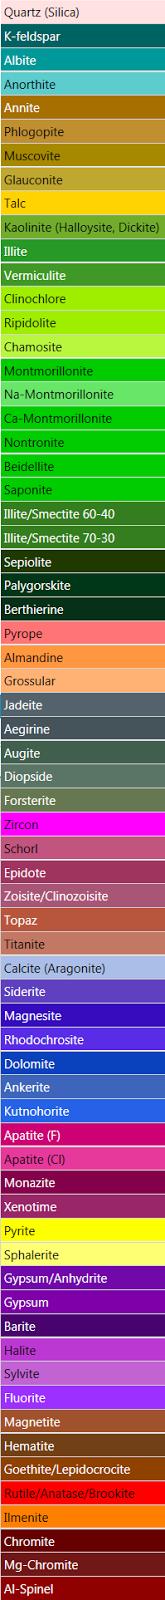 FEI Automated Mineralogy Colour Scheme